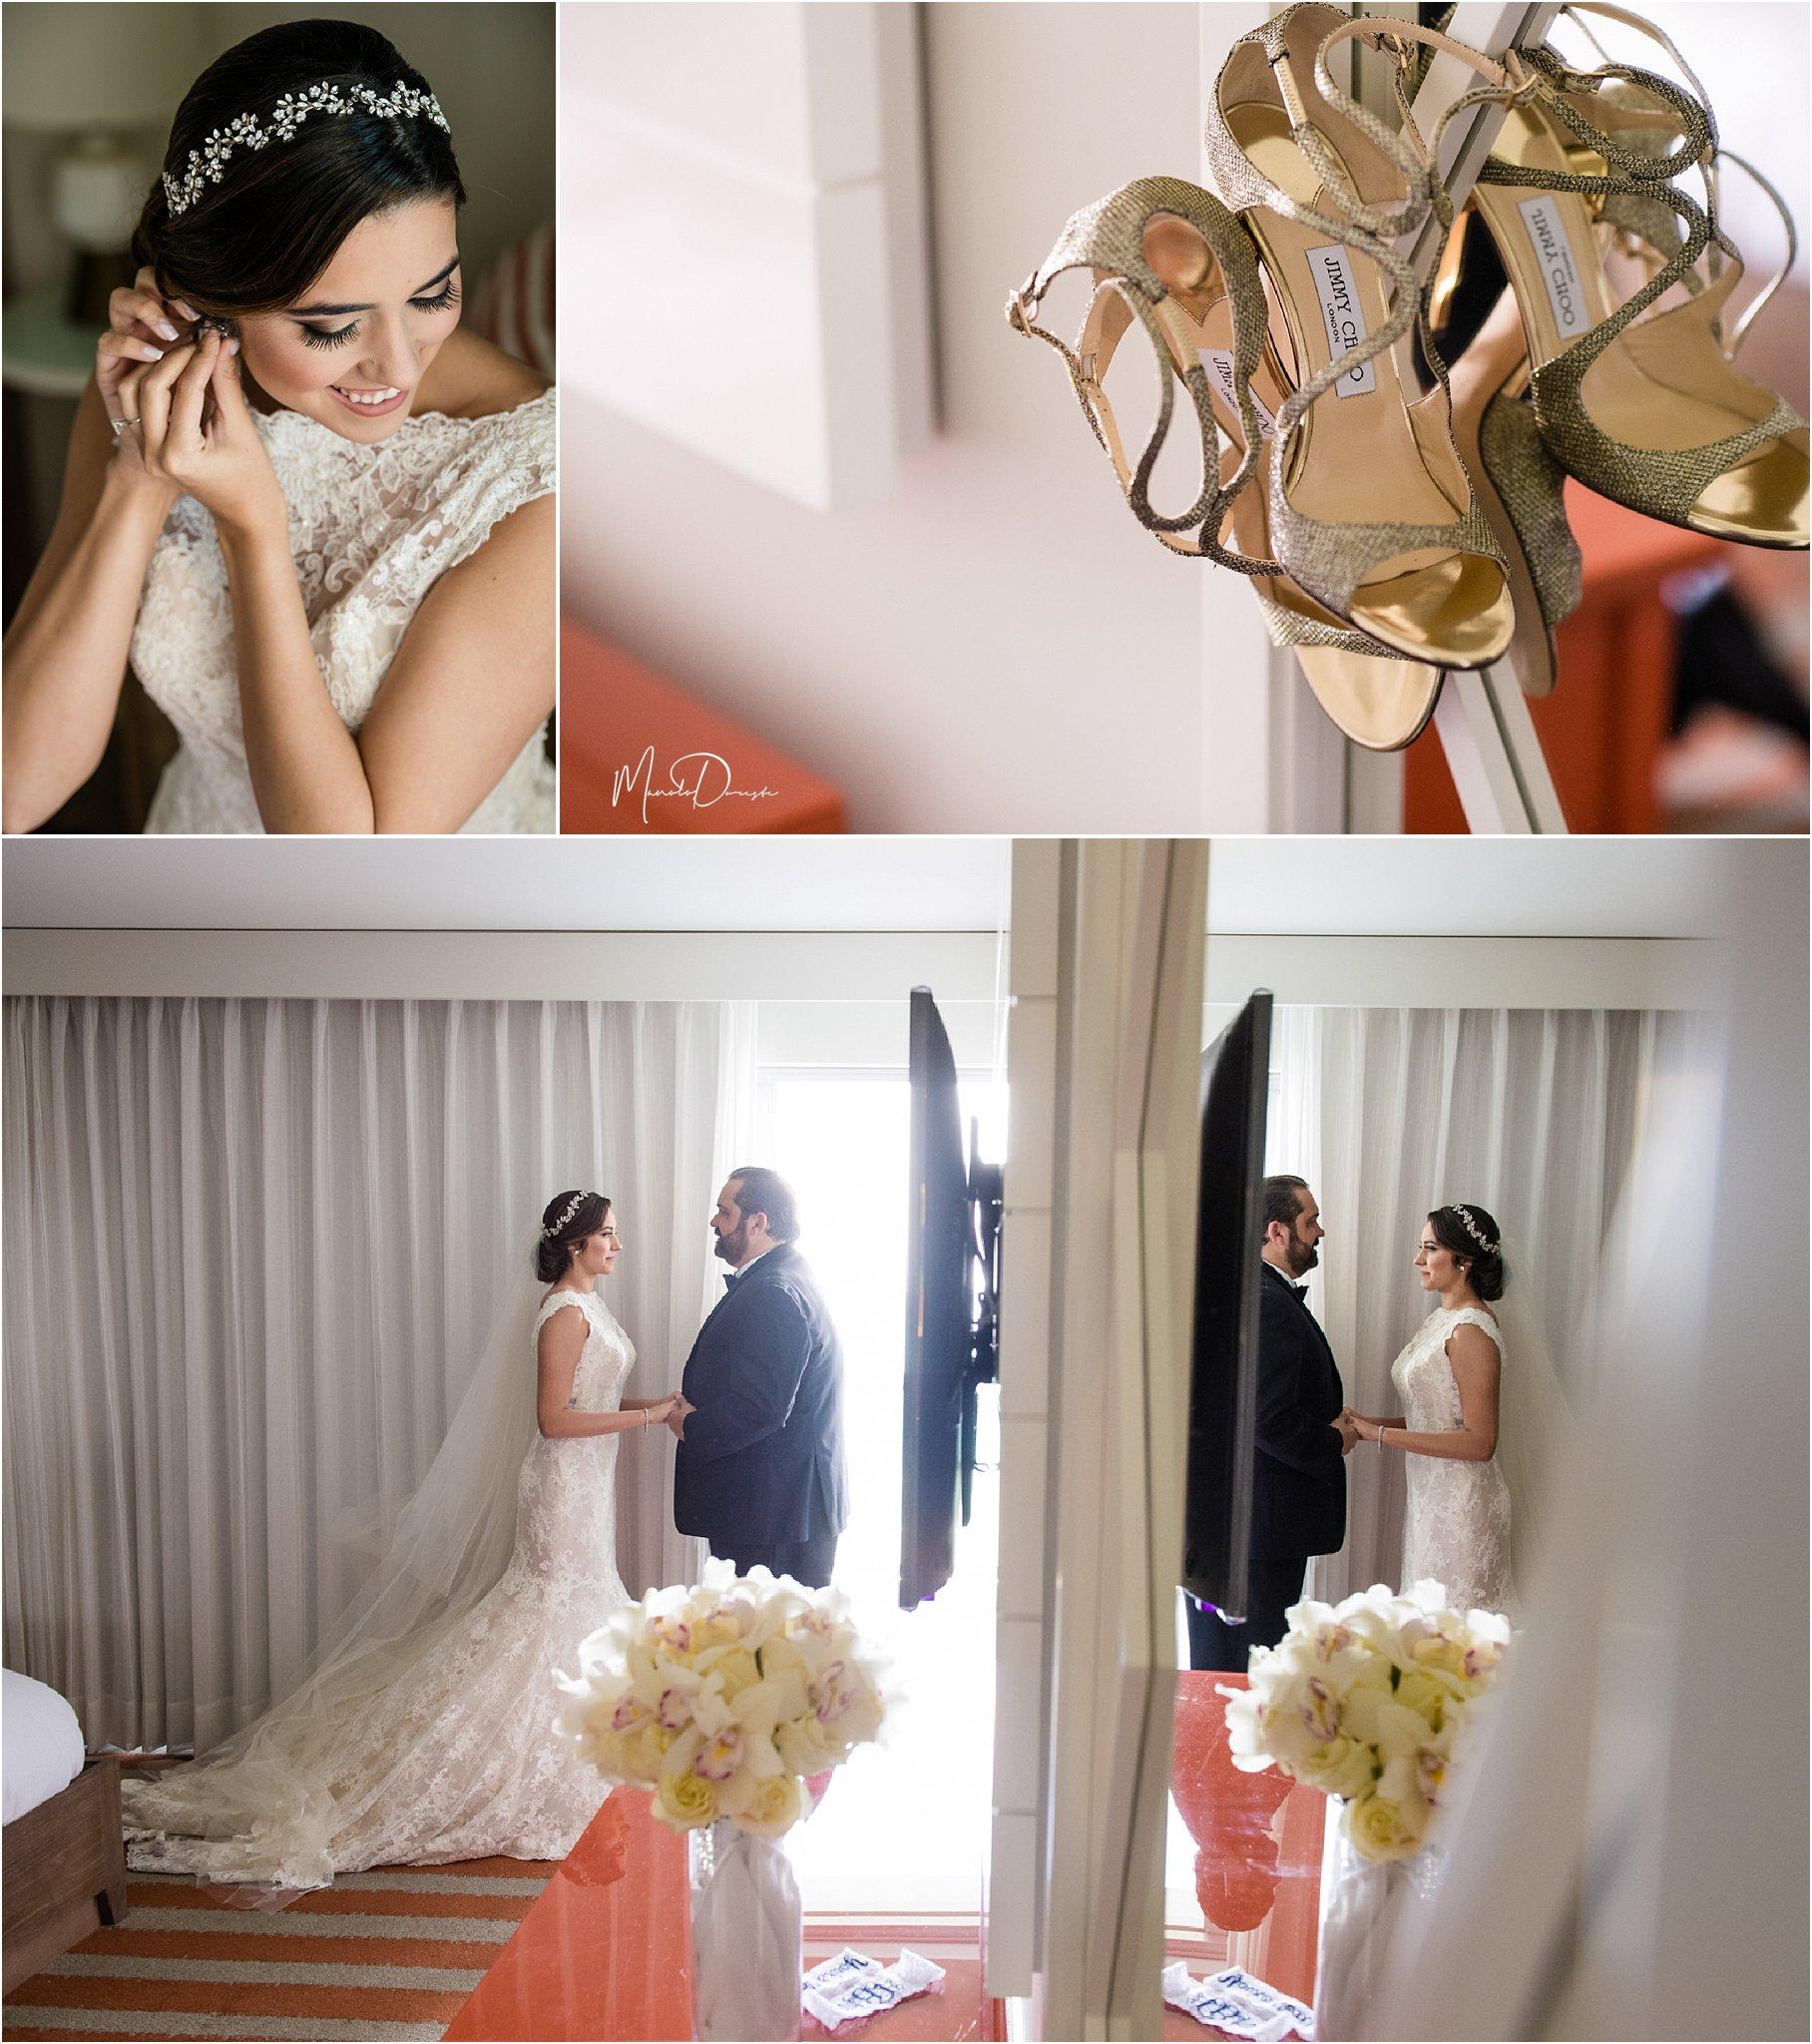 00929_ManoloDoreste_InFocusStudios_Wedding_Family_Photography_Miami_MiamiPhotographer.jpg